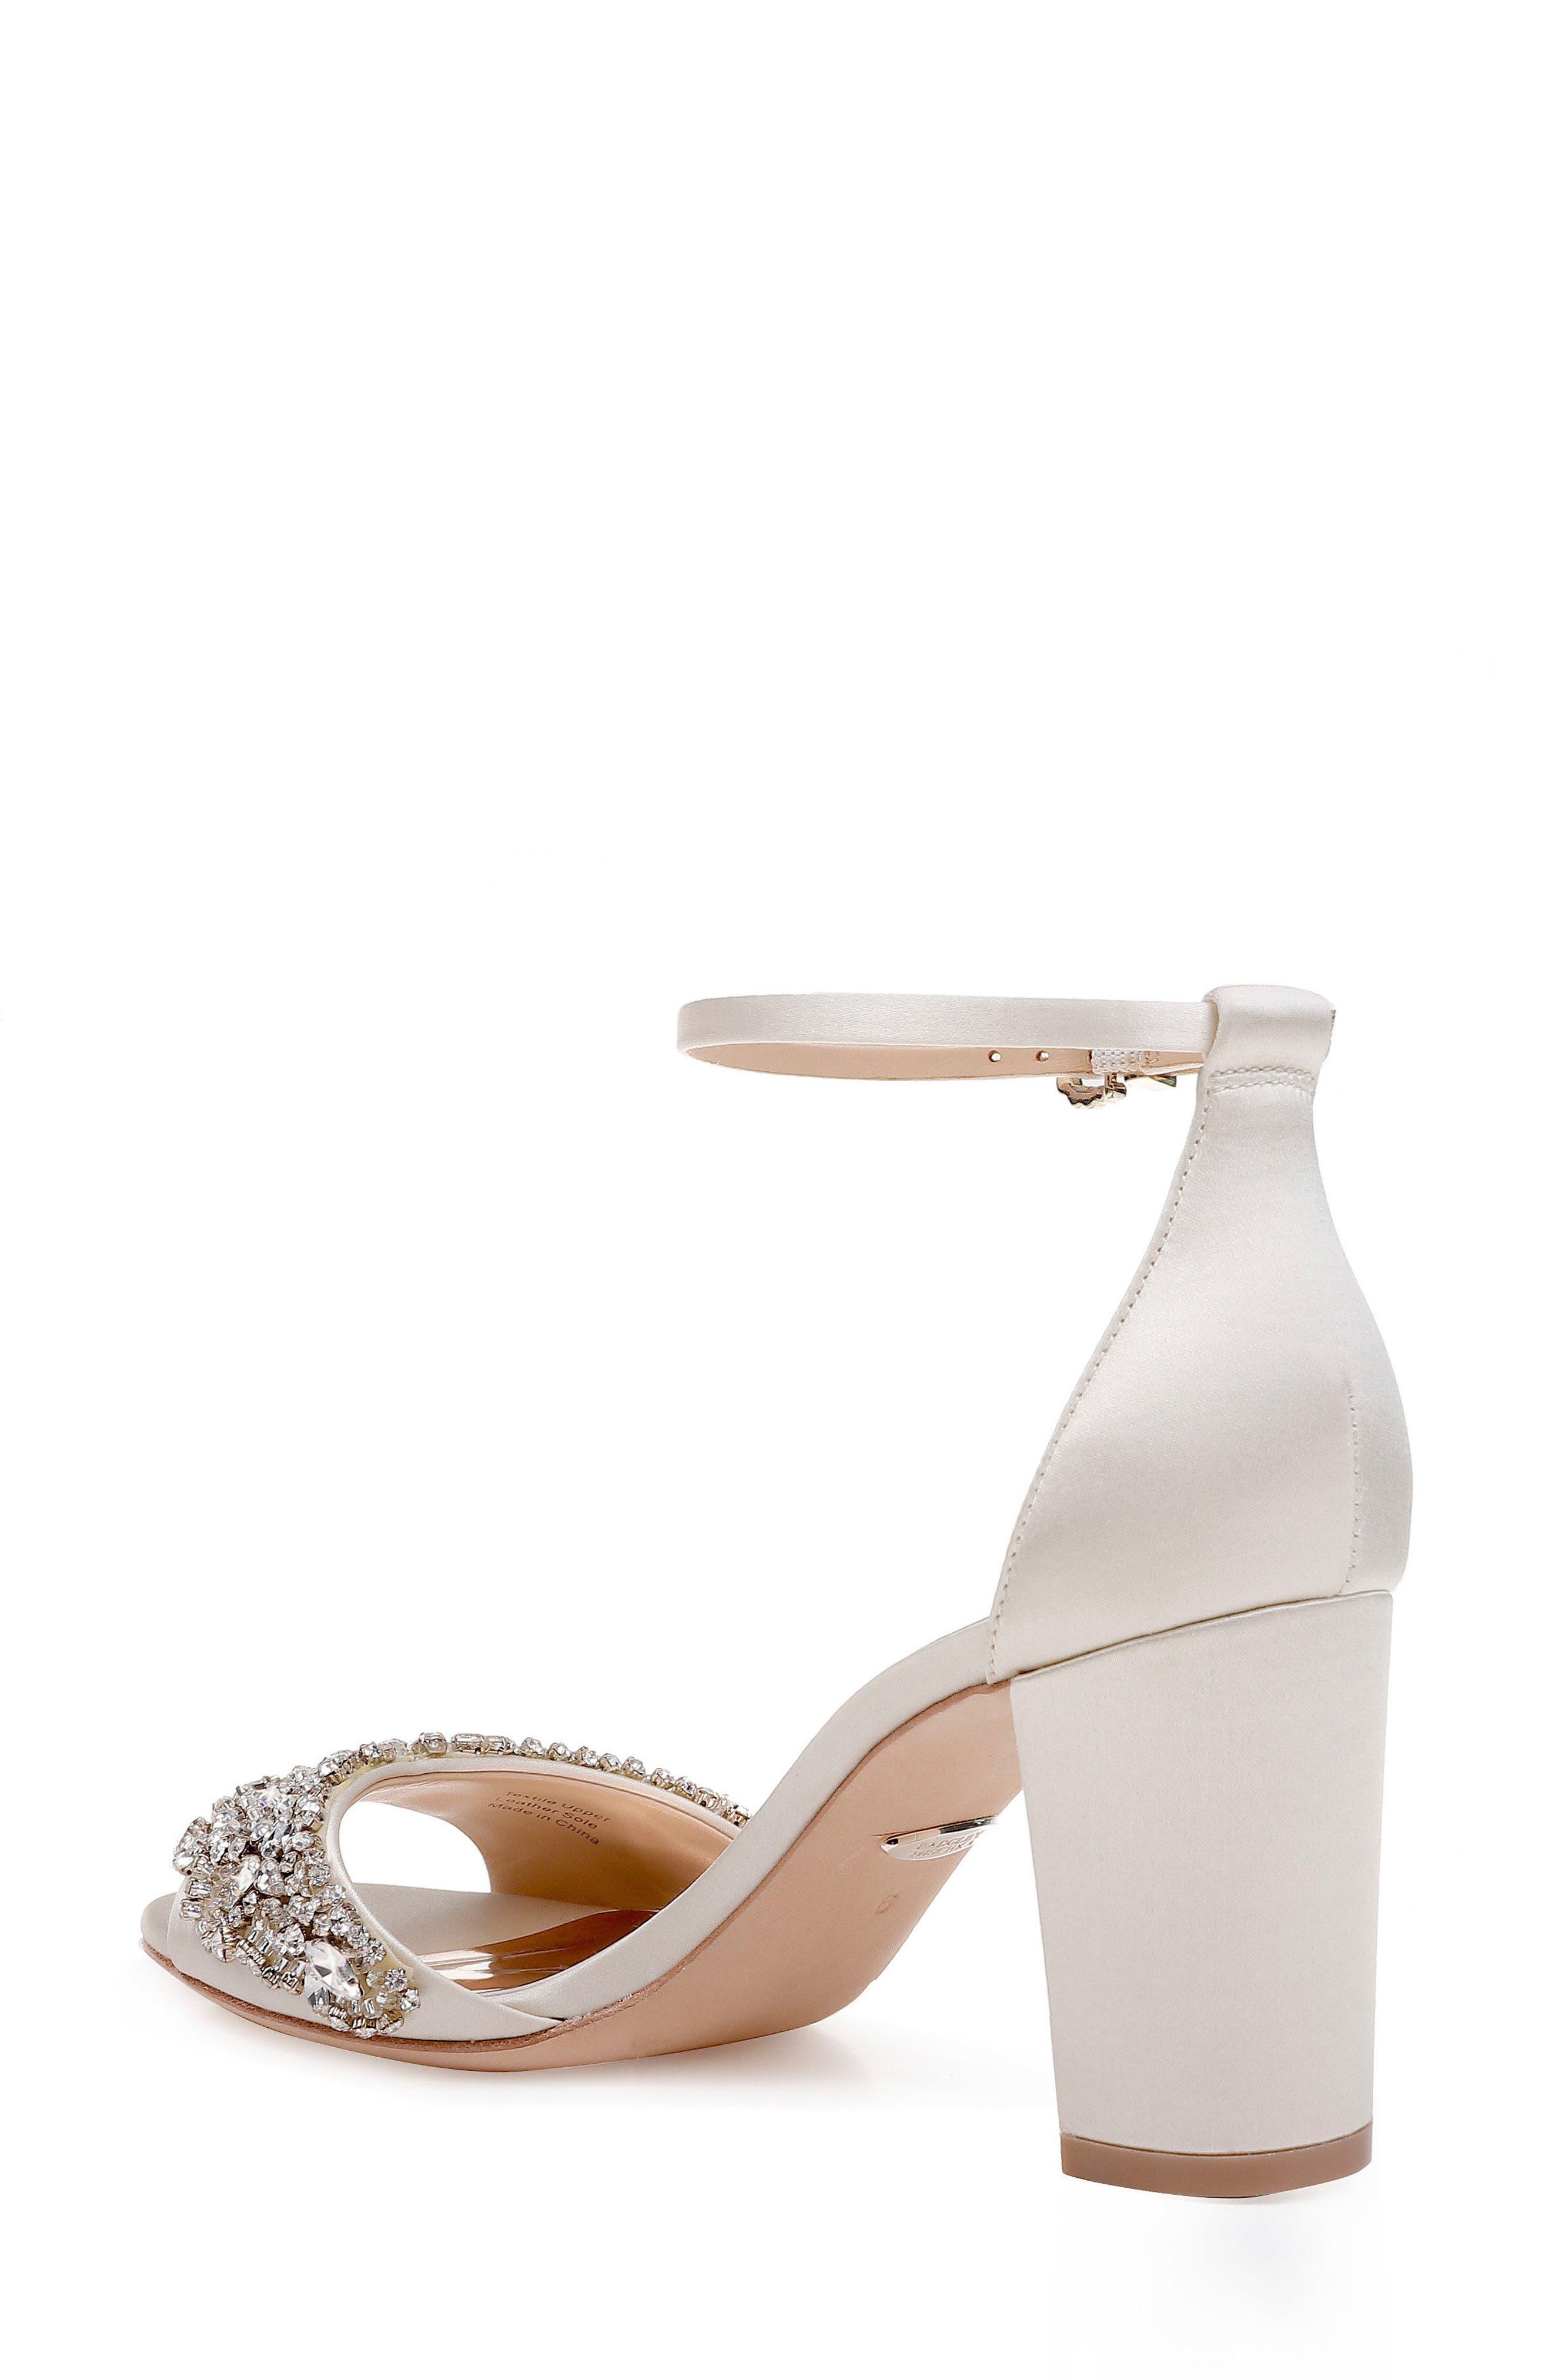 Hines Embellished Block Heel Sandal,                             Alternate thumbnail 8, color,